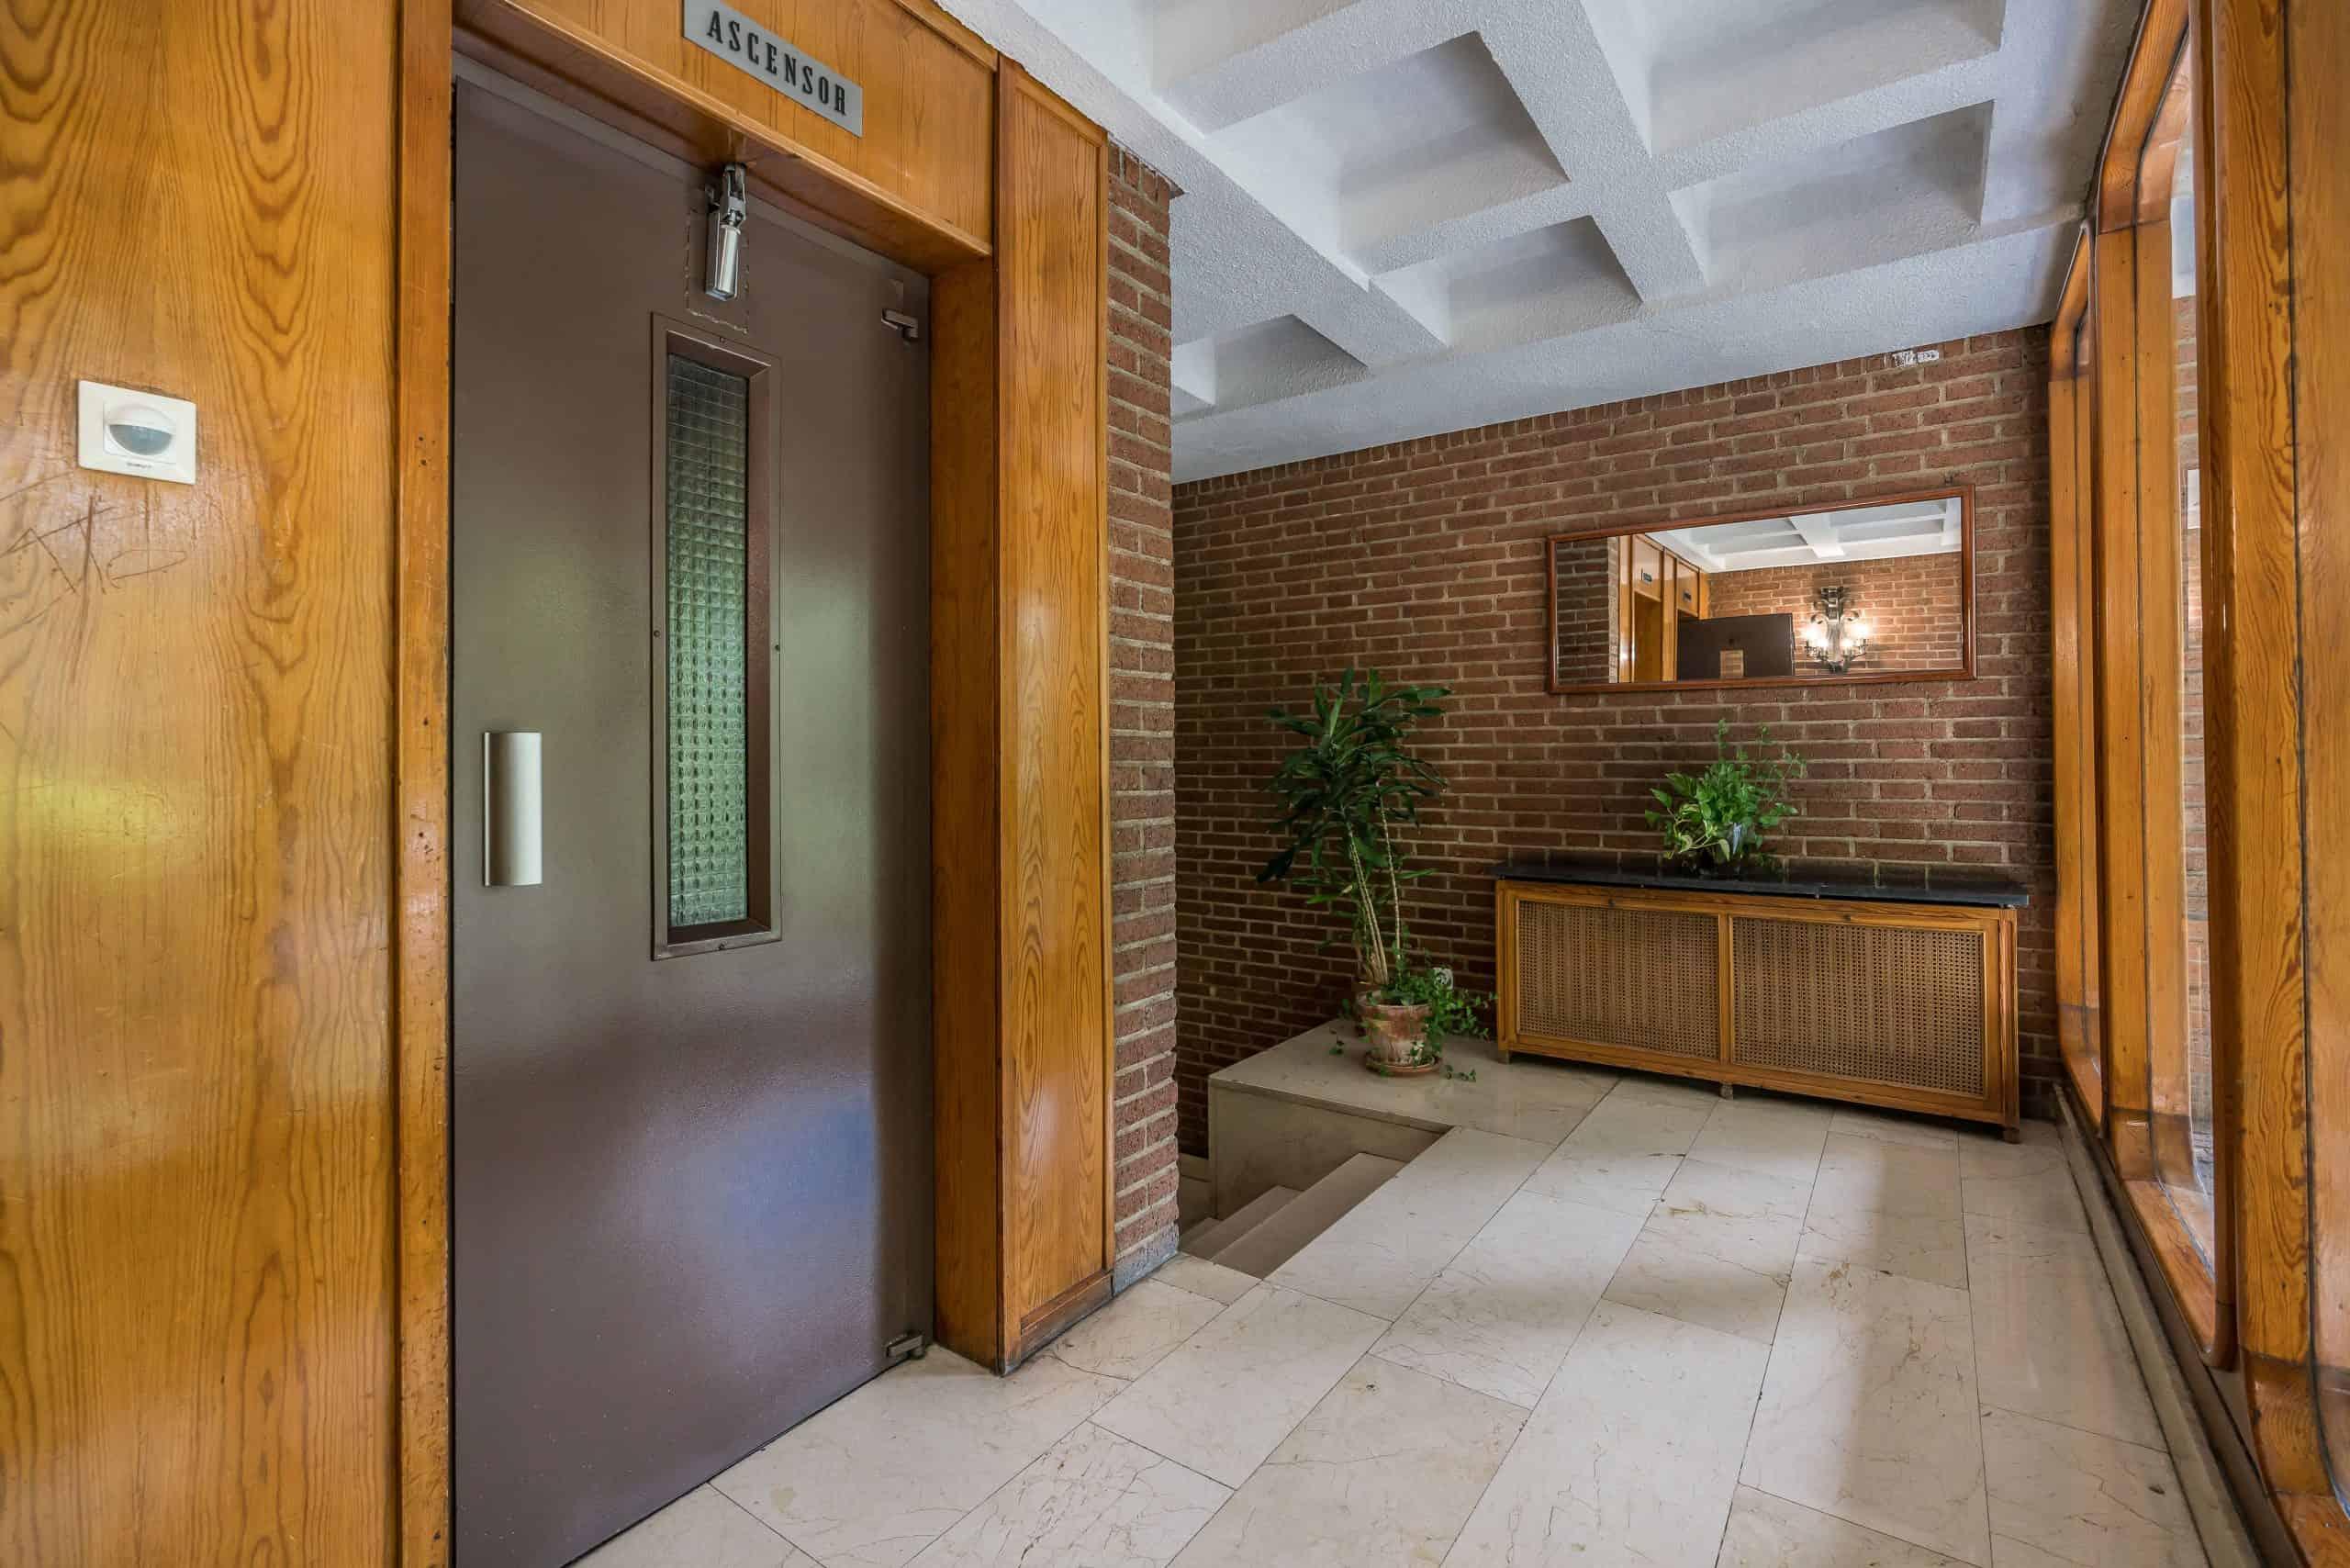 Agencia Inmobiliaria de Madrid-FUTUROCASA-Zona ARGANZUELA-EMBAJADORES-LEGAZPI -calle Embajadores- baño 182